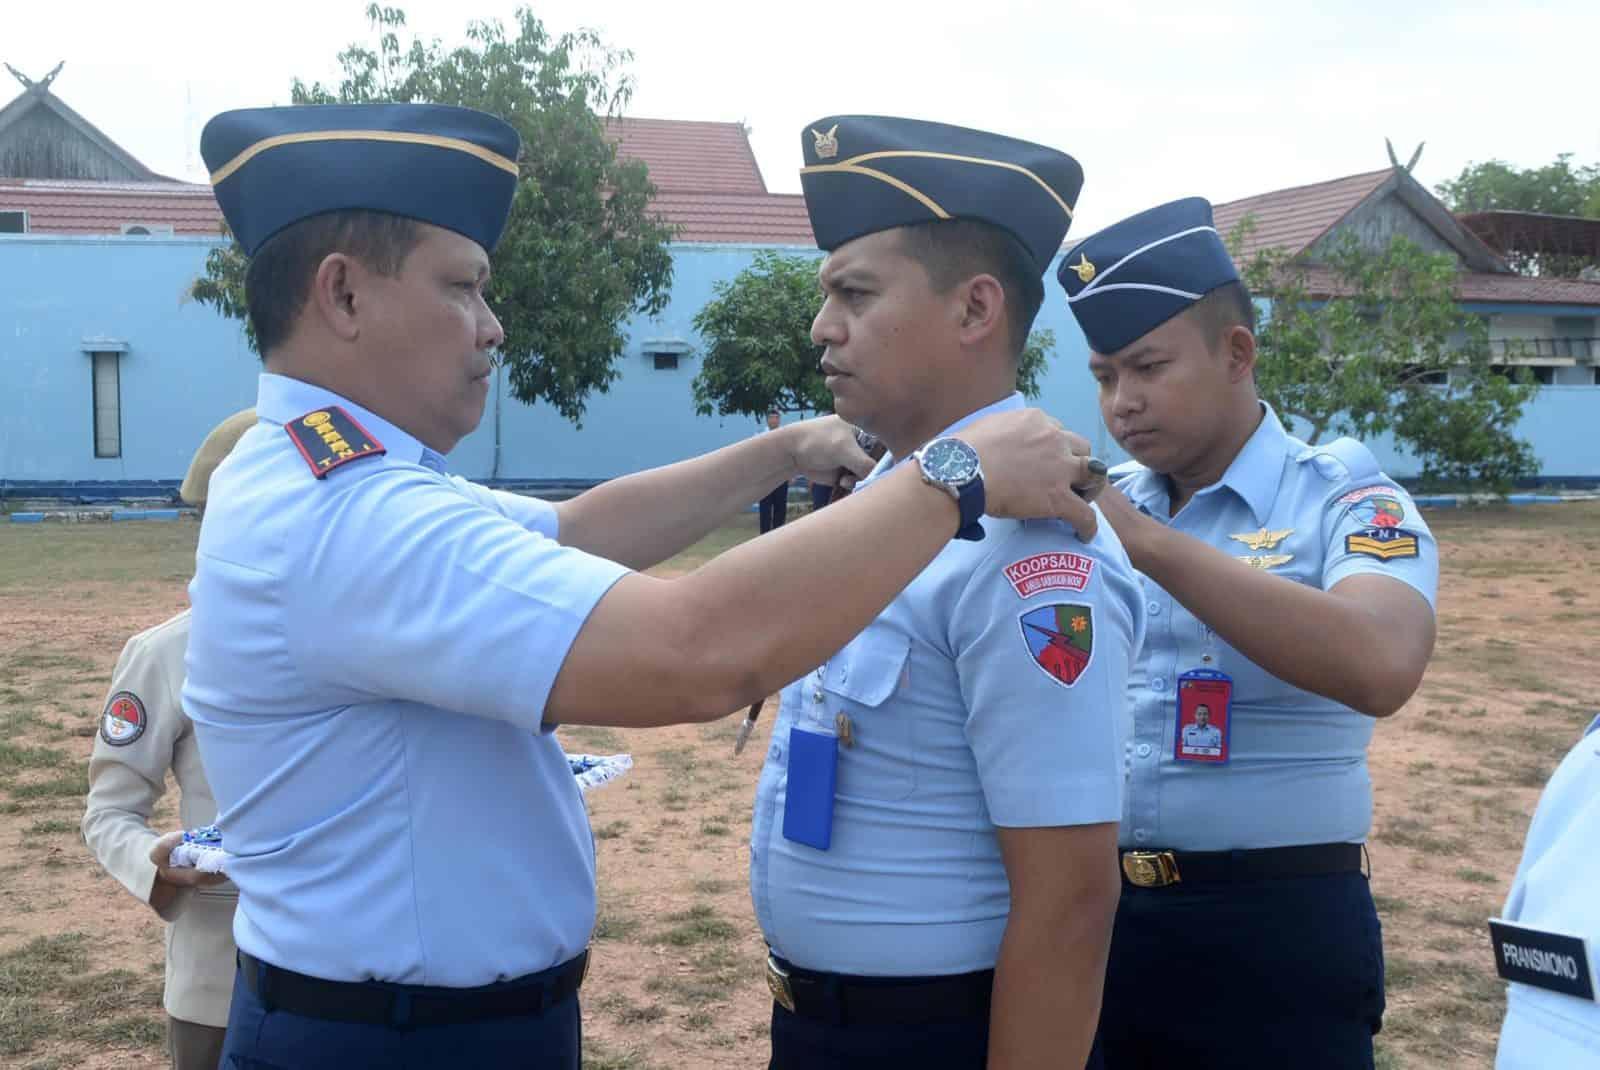 ''Pangkat Baru, Semangat Baru'' Laporan Korps Kenaikan Pangkat di Lanud Sjamsudin Noor